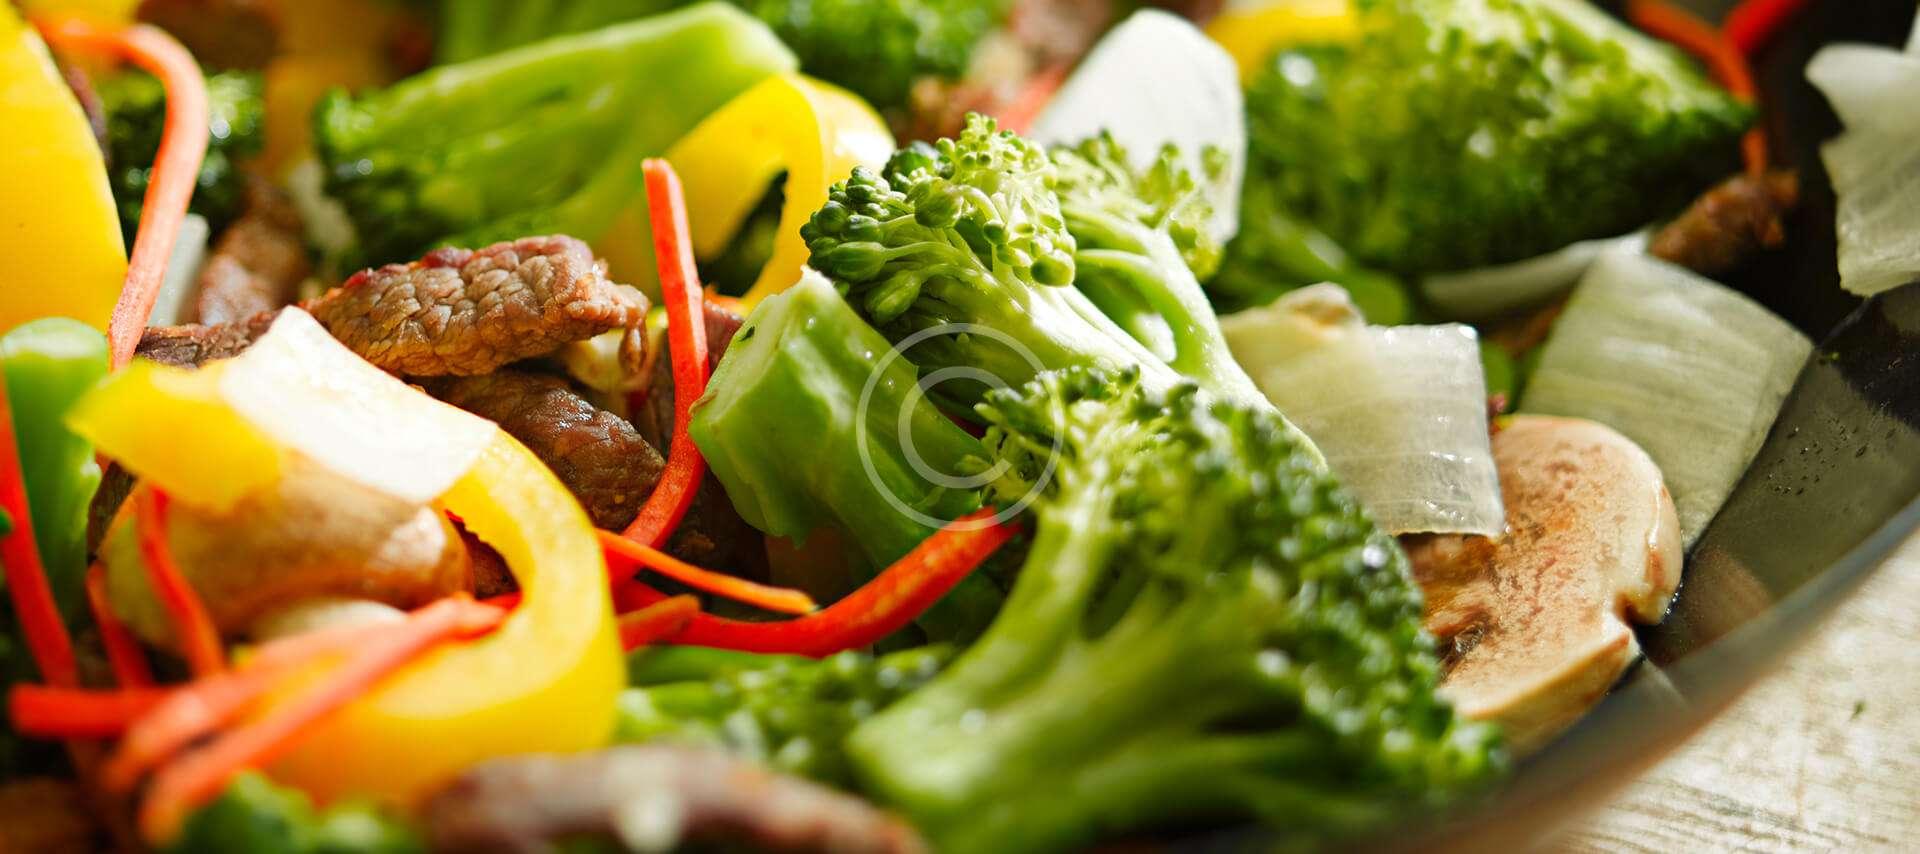 Broccoli Salad with Sour Cream Dressing